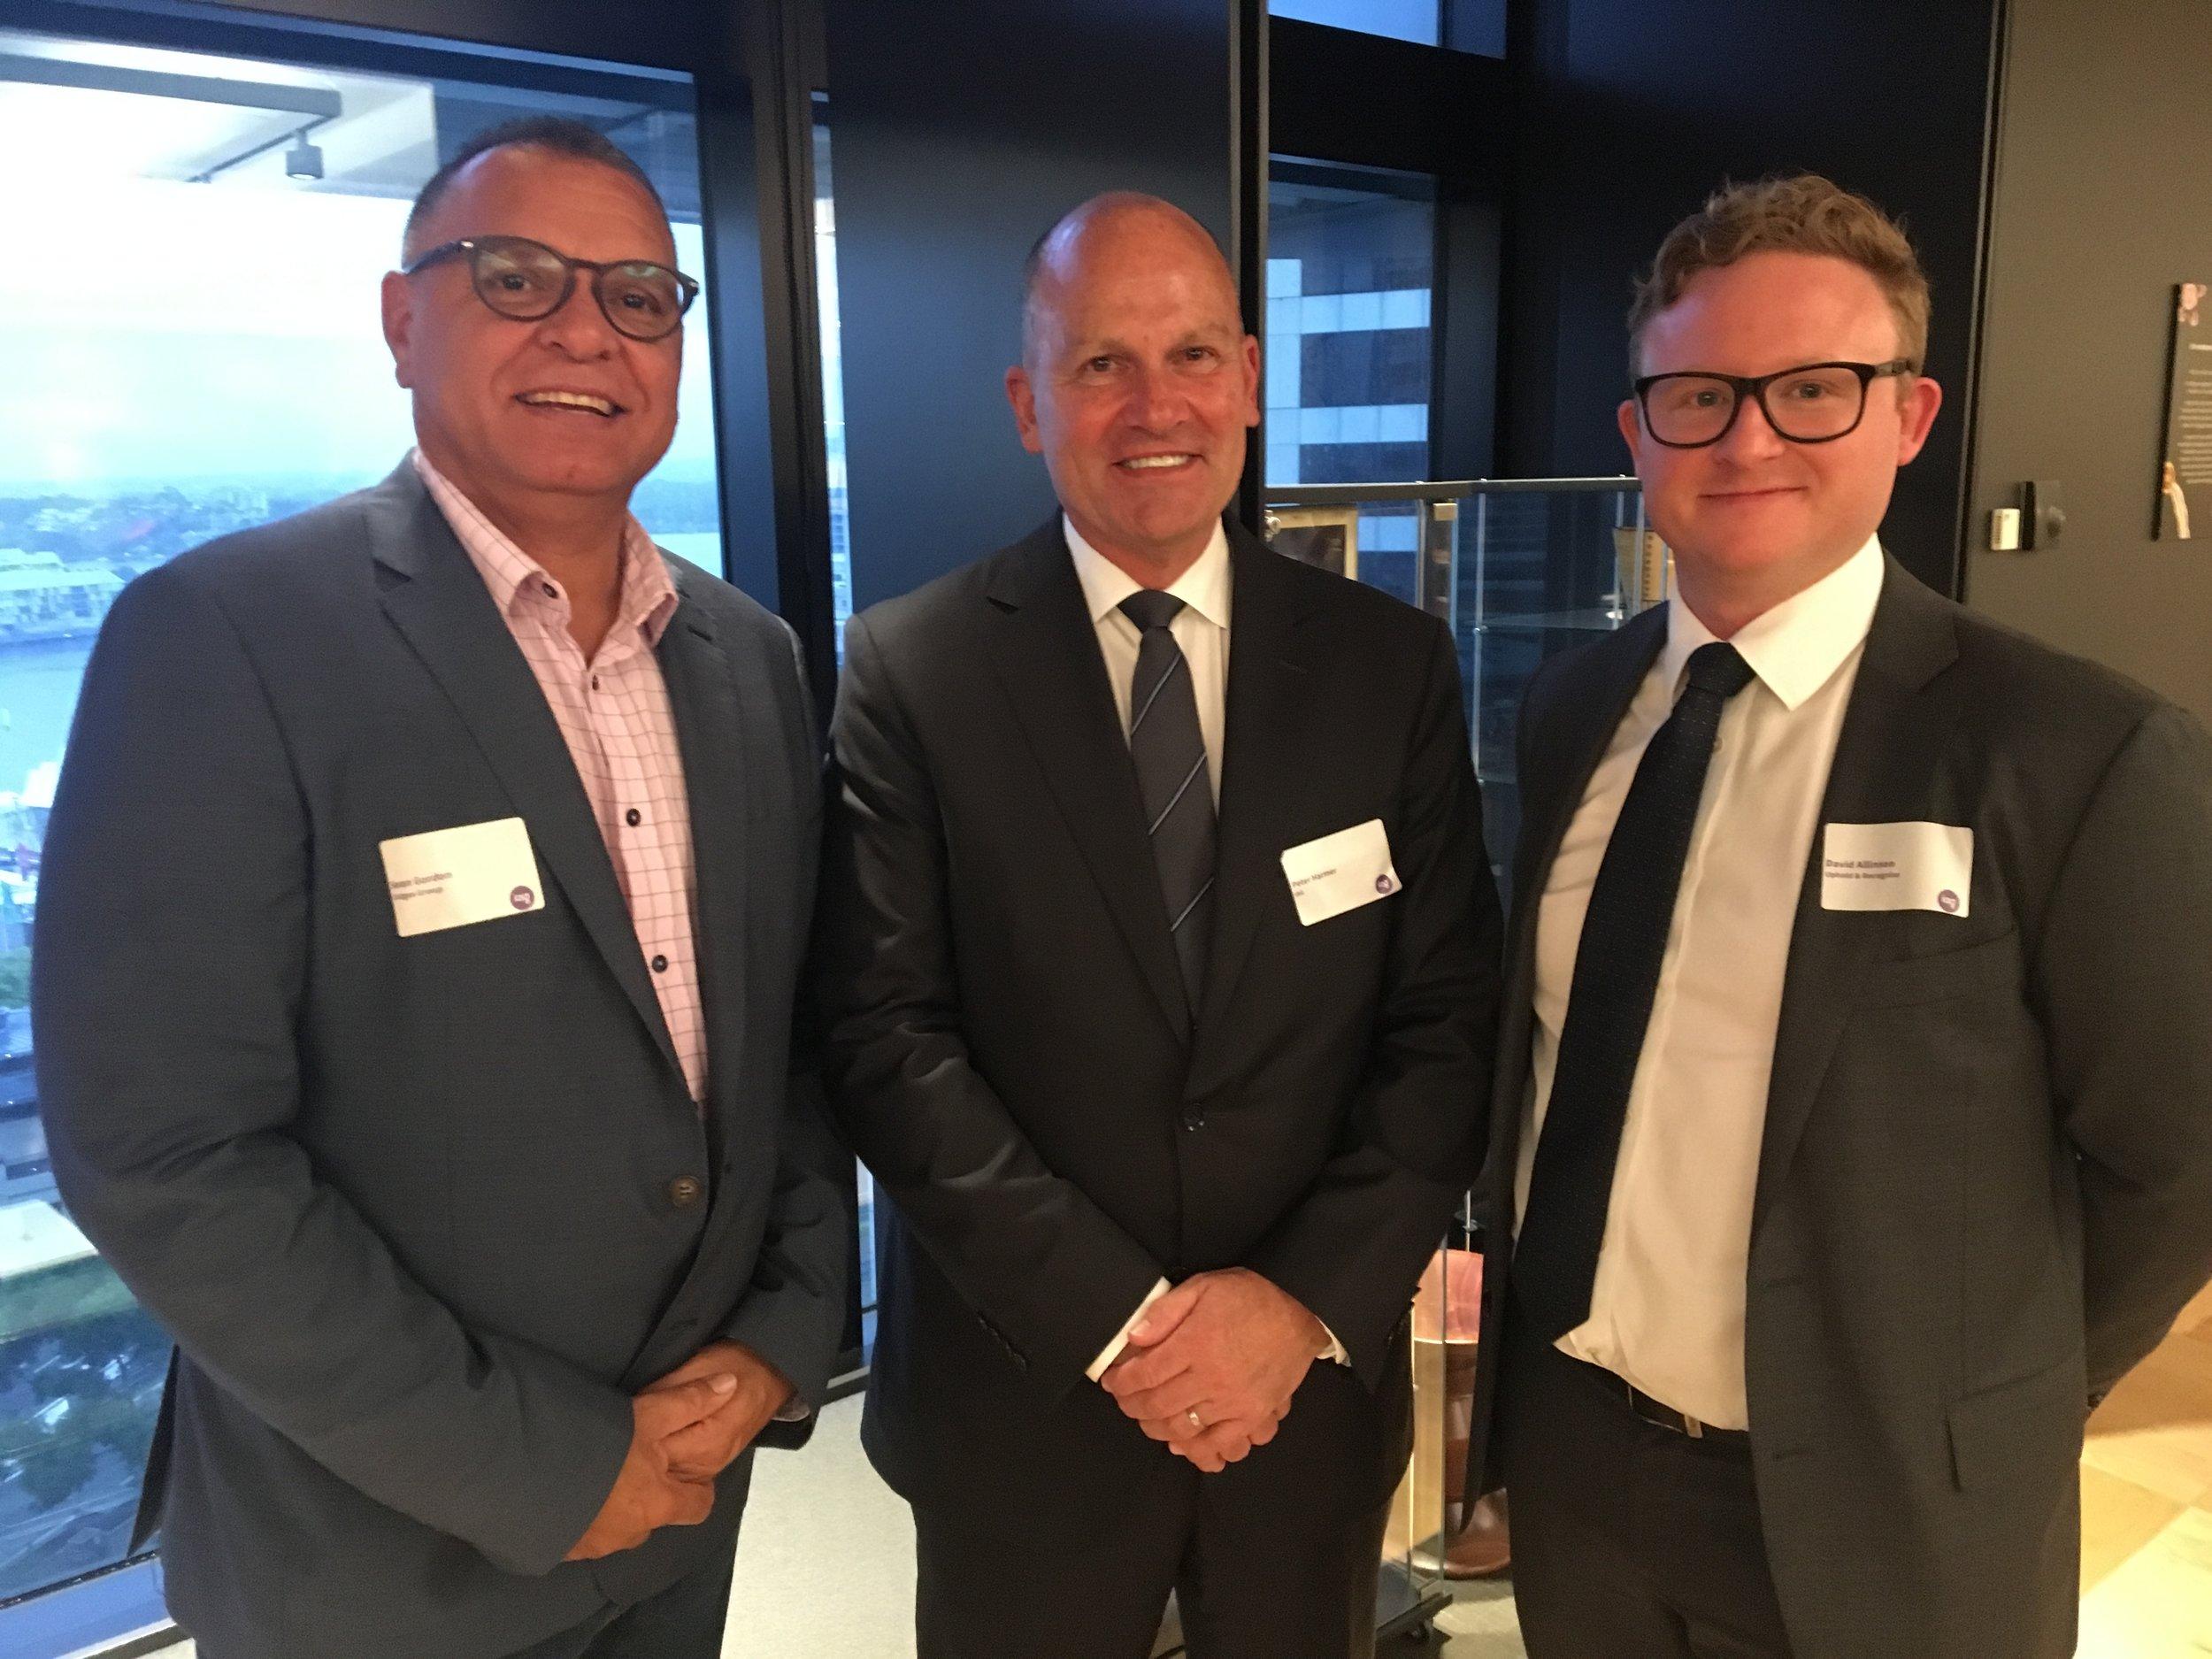 Sean Gordon, David Allinson, and Peter Harmer at the IAG RAP launch, 21 Feb 2019